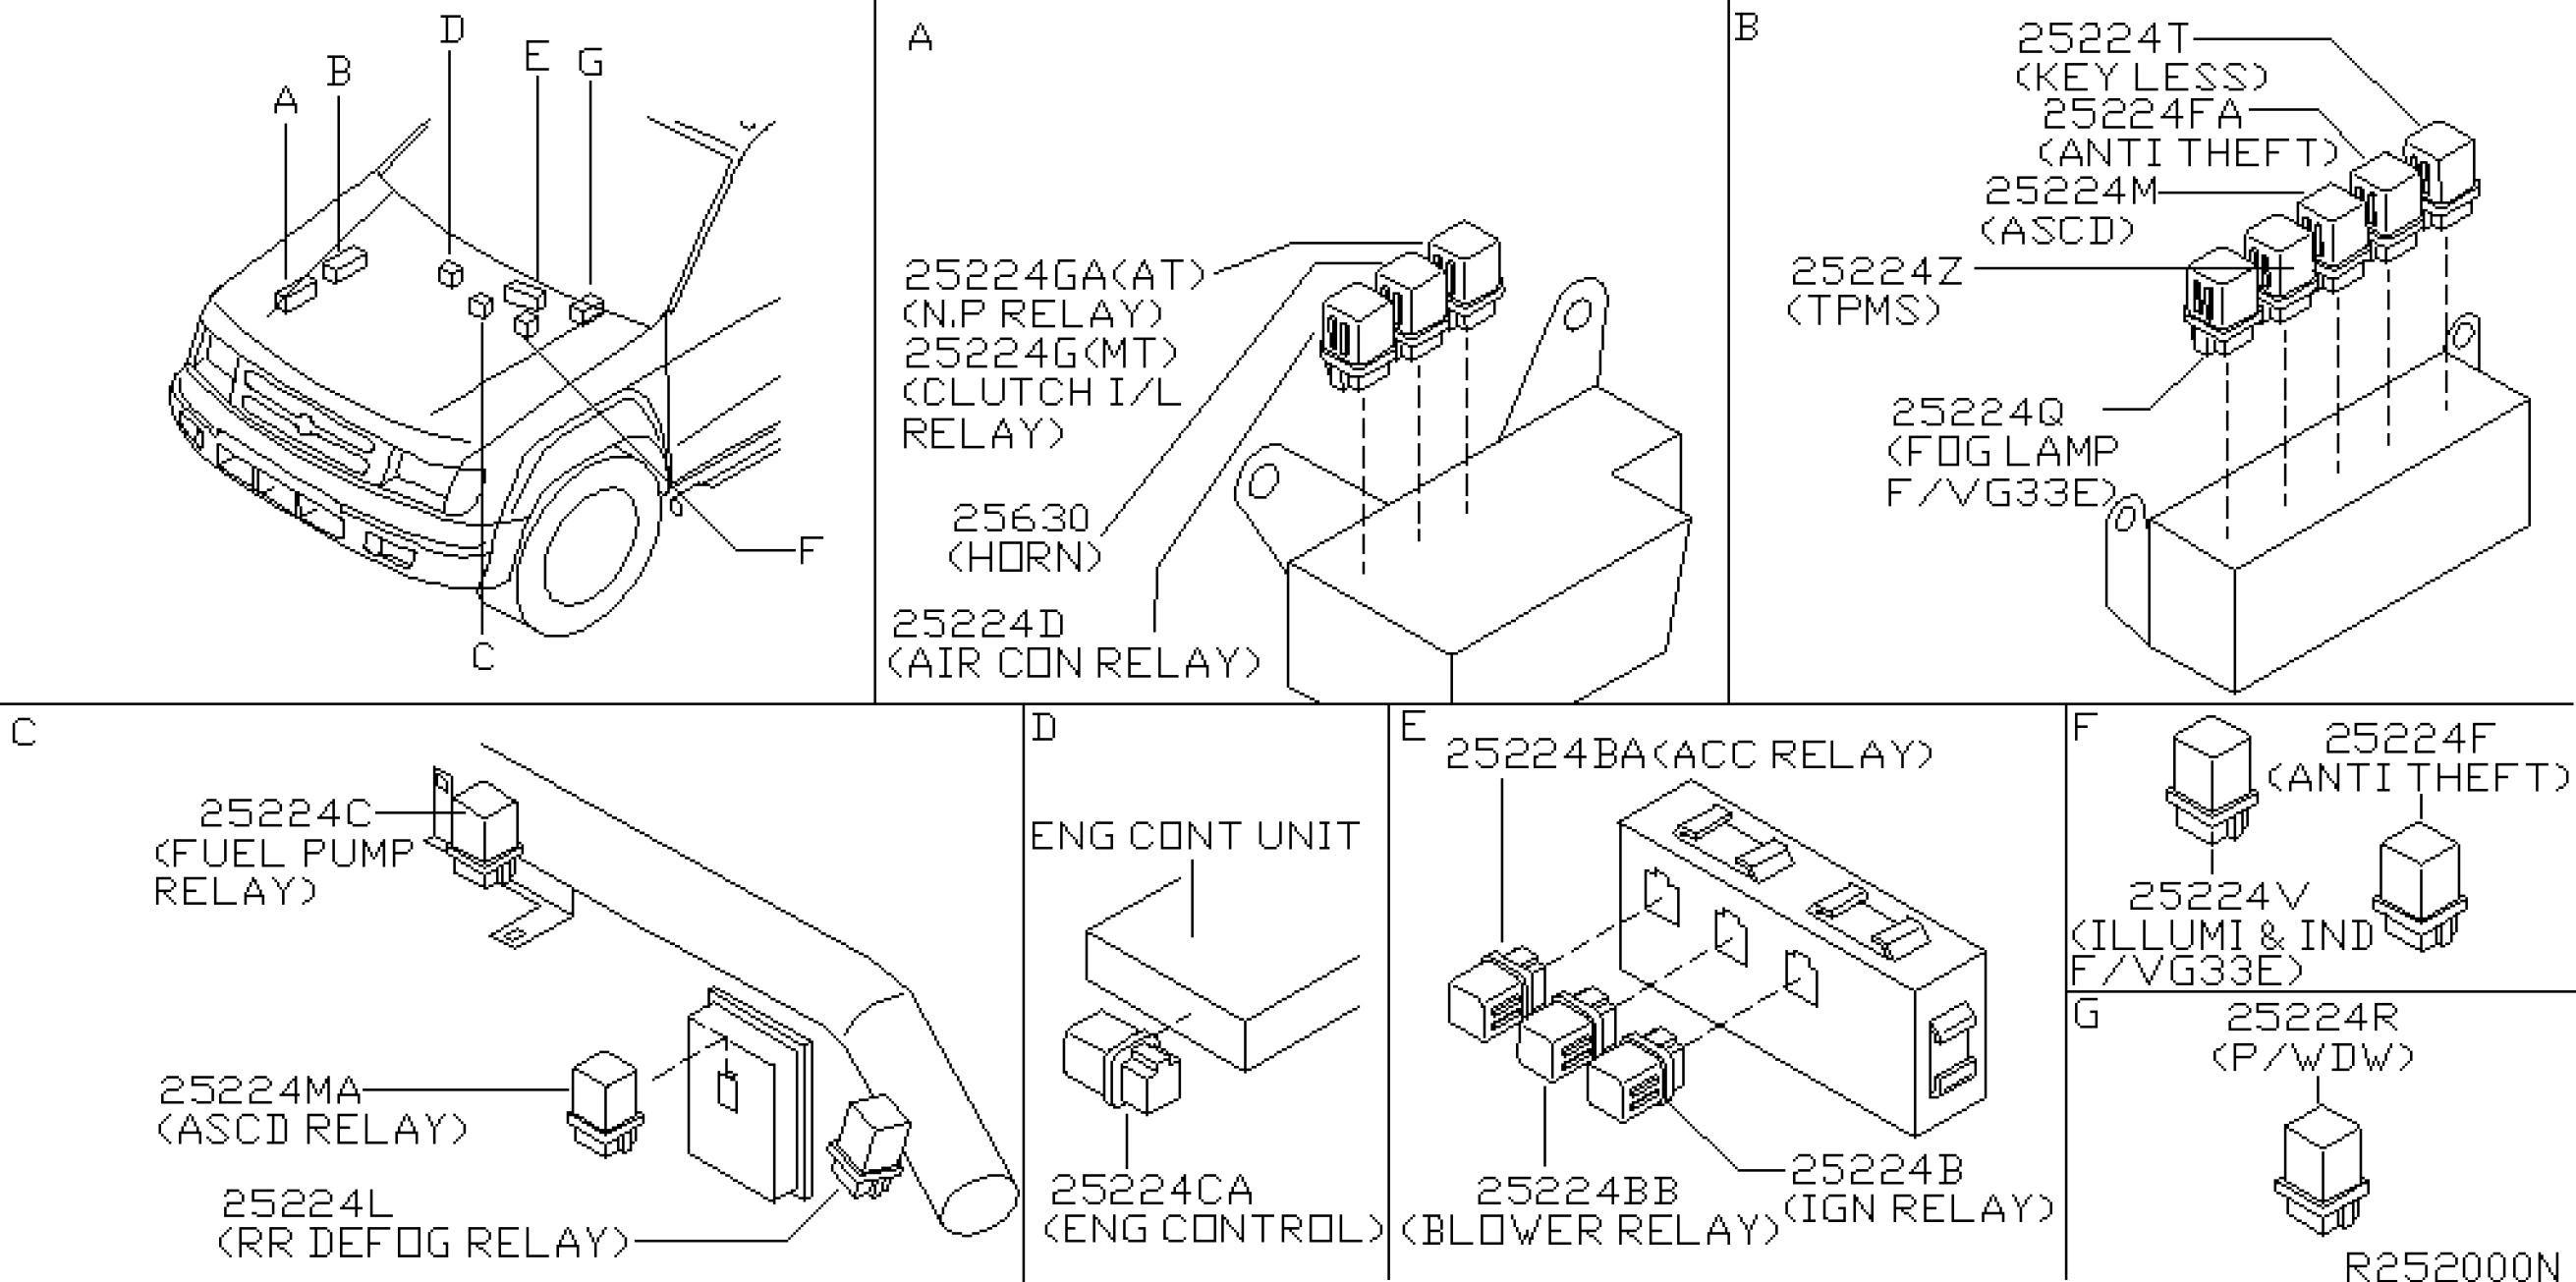 Nissan Xterra Engine Diagram 2003 Nissan Xterra Oem Parts Nissan Usa Estore